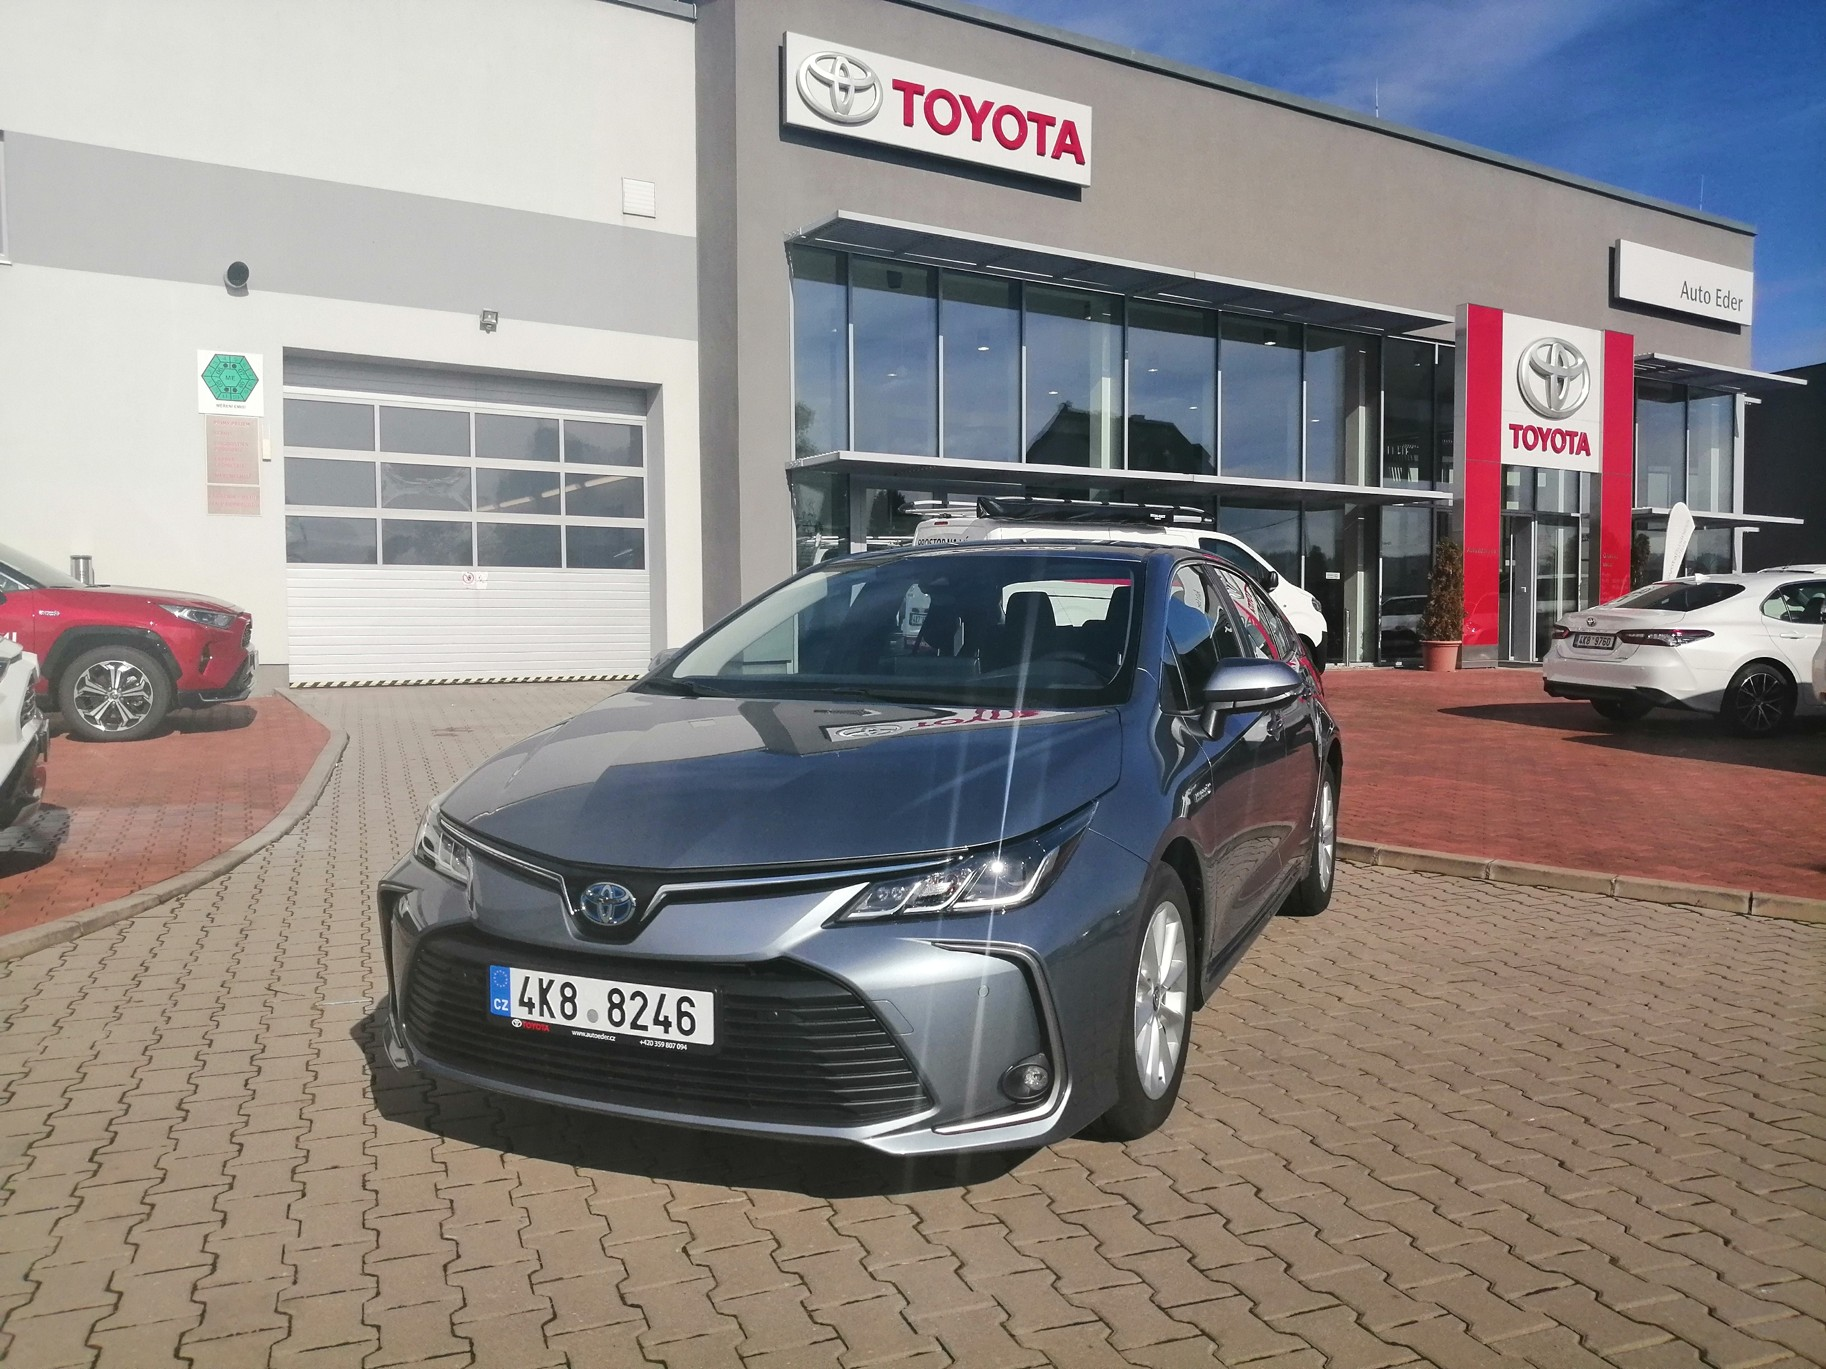 Toyota COROLLA Sedan 1,8 Hybrid (122 k) aut. převodovka